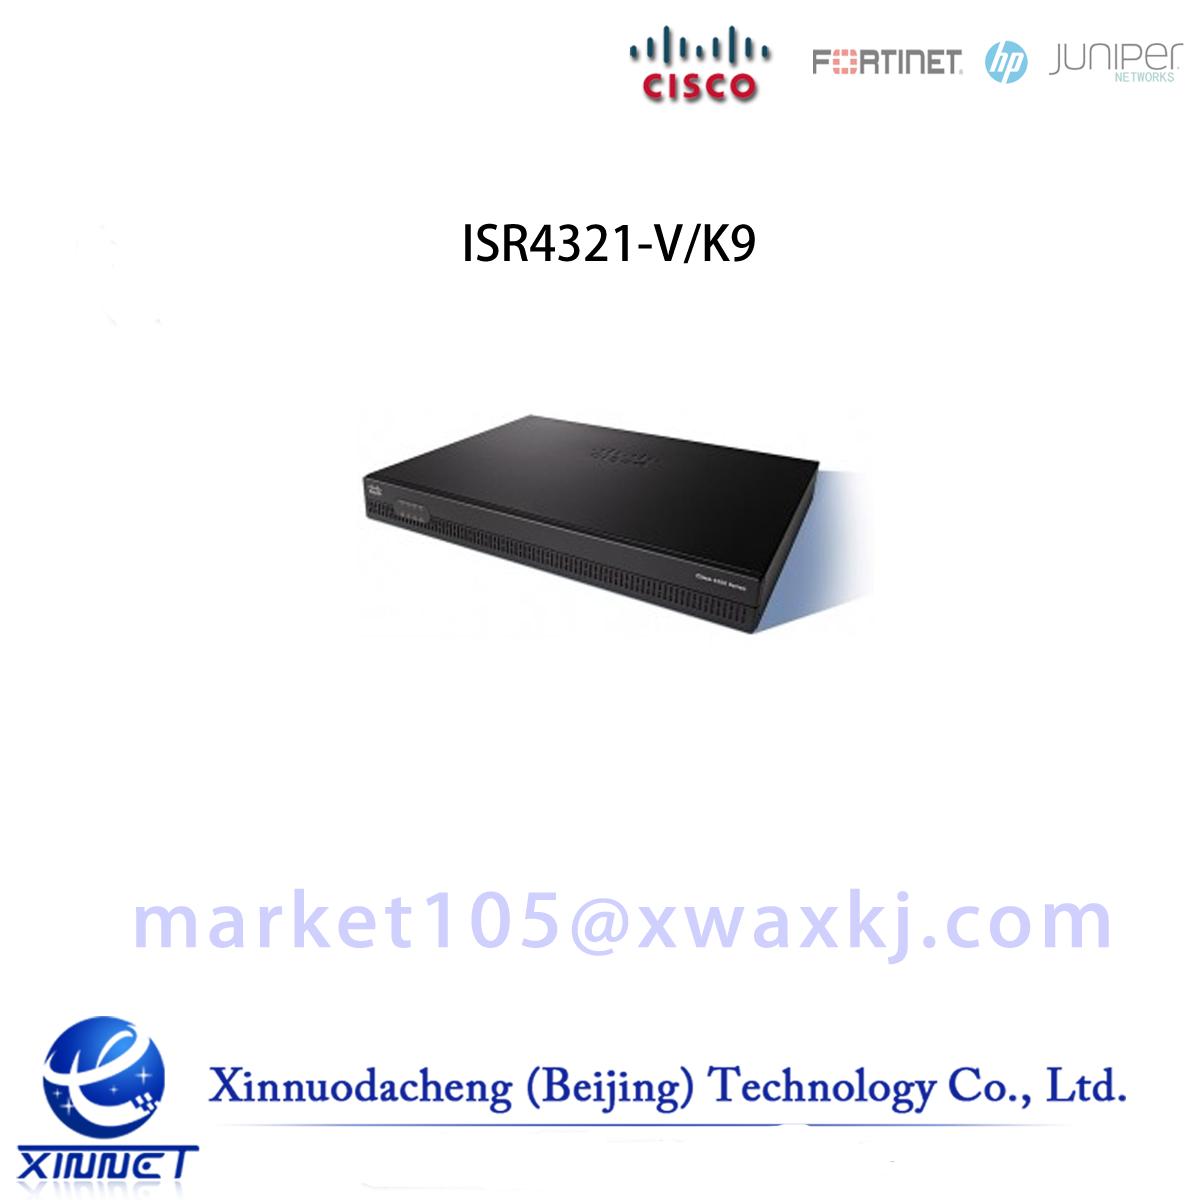 ISR4321-V/K9 Cisco ISR 4321 Bundle, w/UC License, CUBE-10